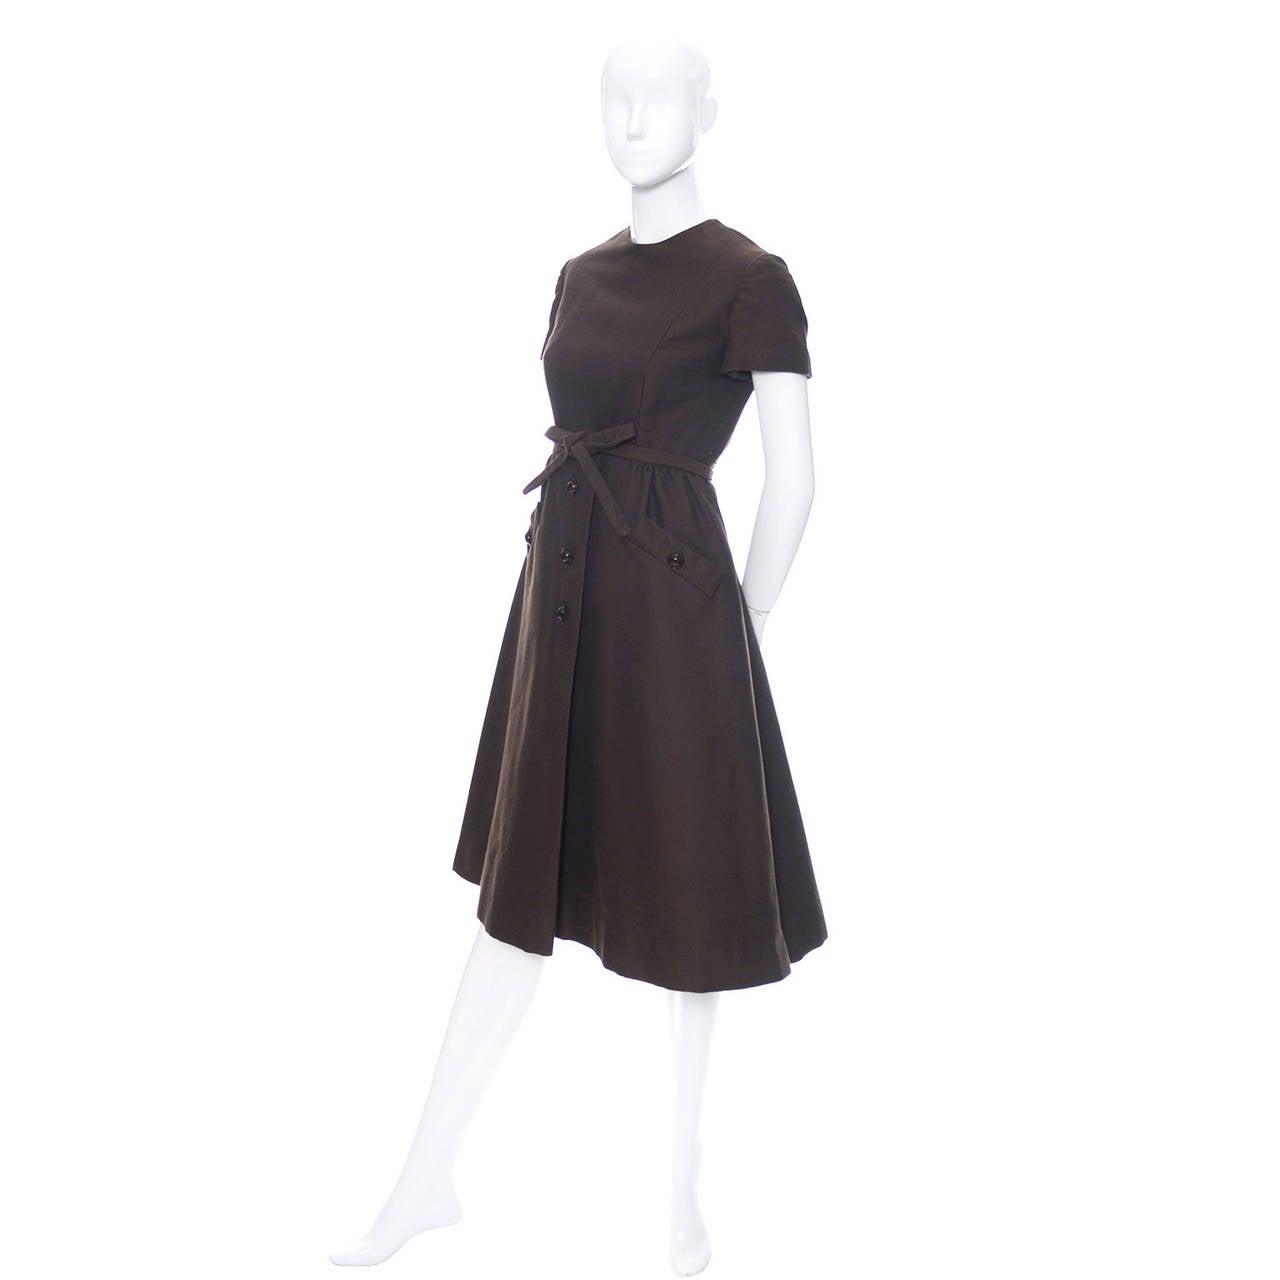 Black Chocolate Brown Geoffrey Beene 1960s Mod Vintage Dress Pockets Belt For Sale